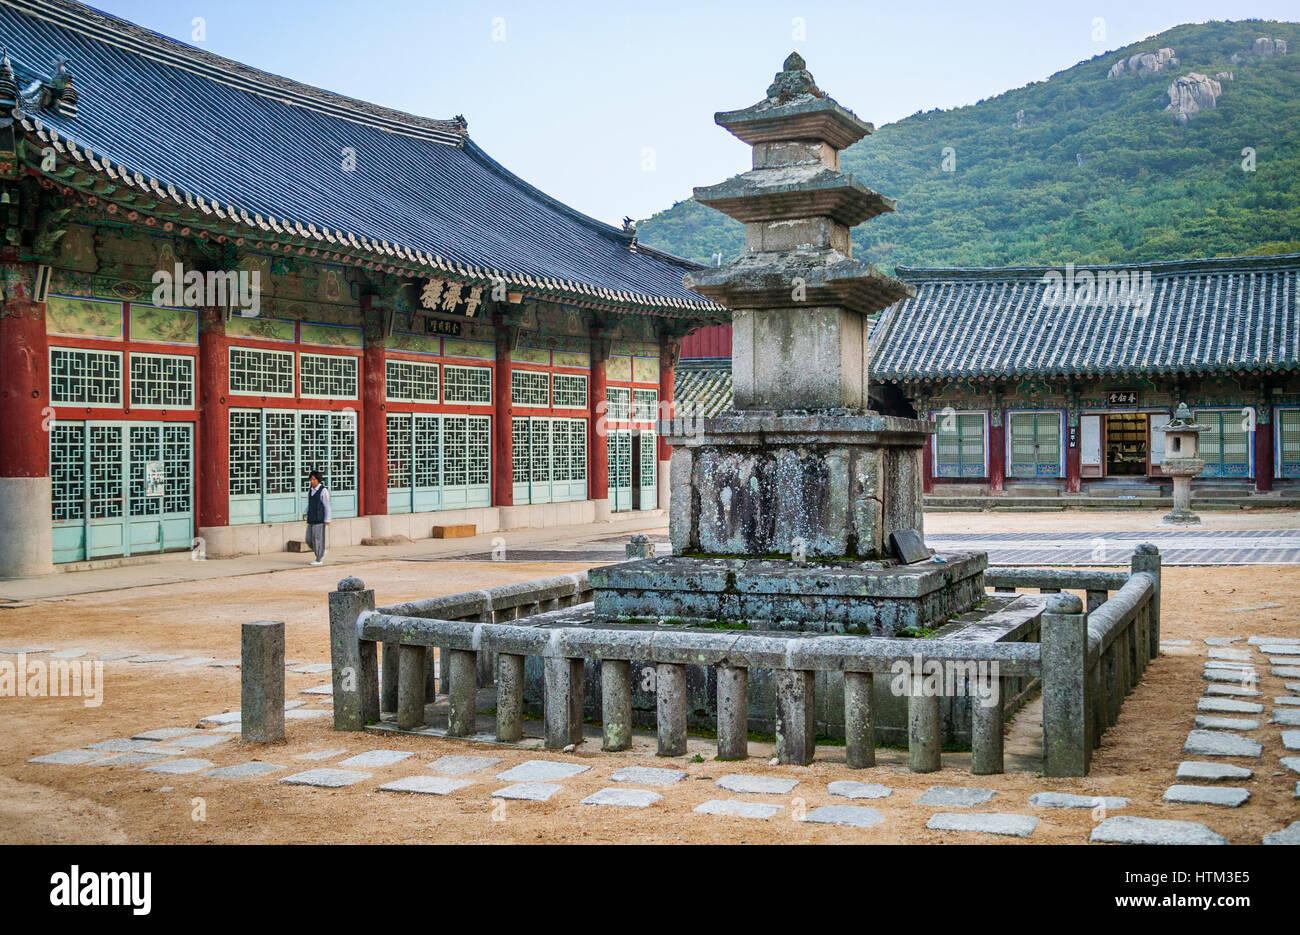 South Korea, Cheongnyong-dong, Busan, Beomeosa temple, ancient 9th century Three Story Stone Pagoda - Stock Image